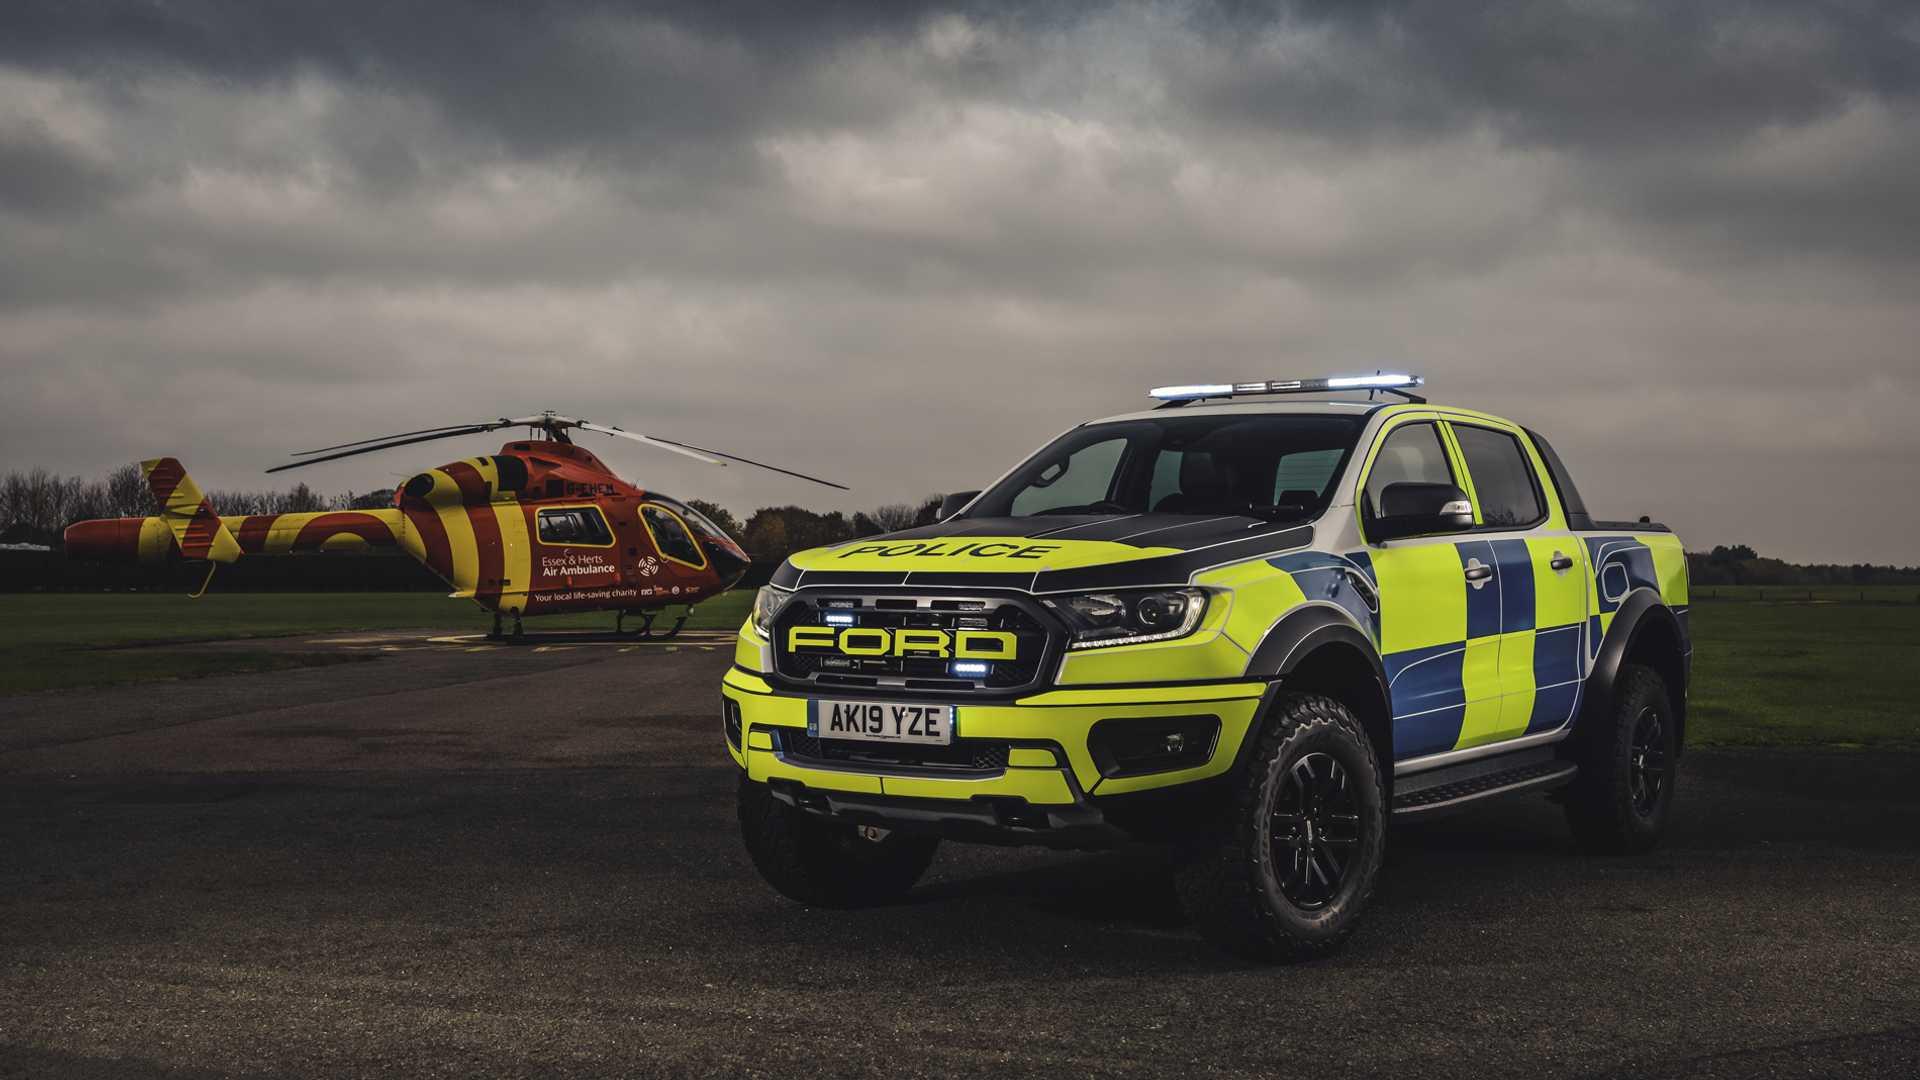 Ford-Focus-ST-and-Ranger-Raptor-UK-police-cars-4